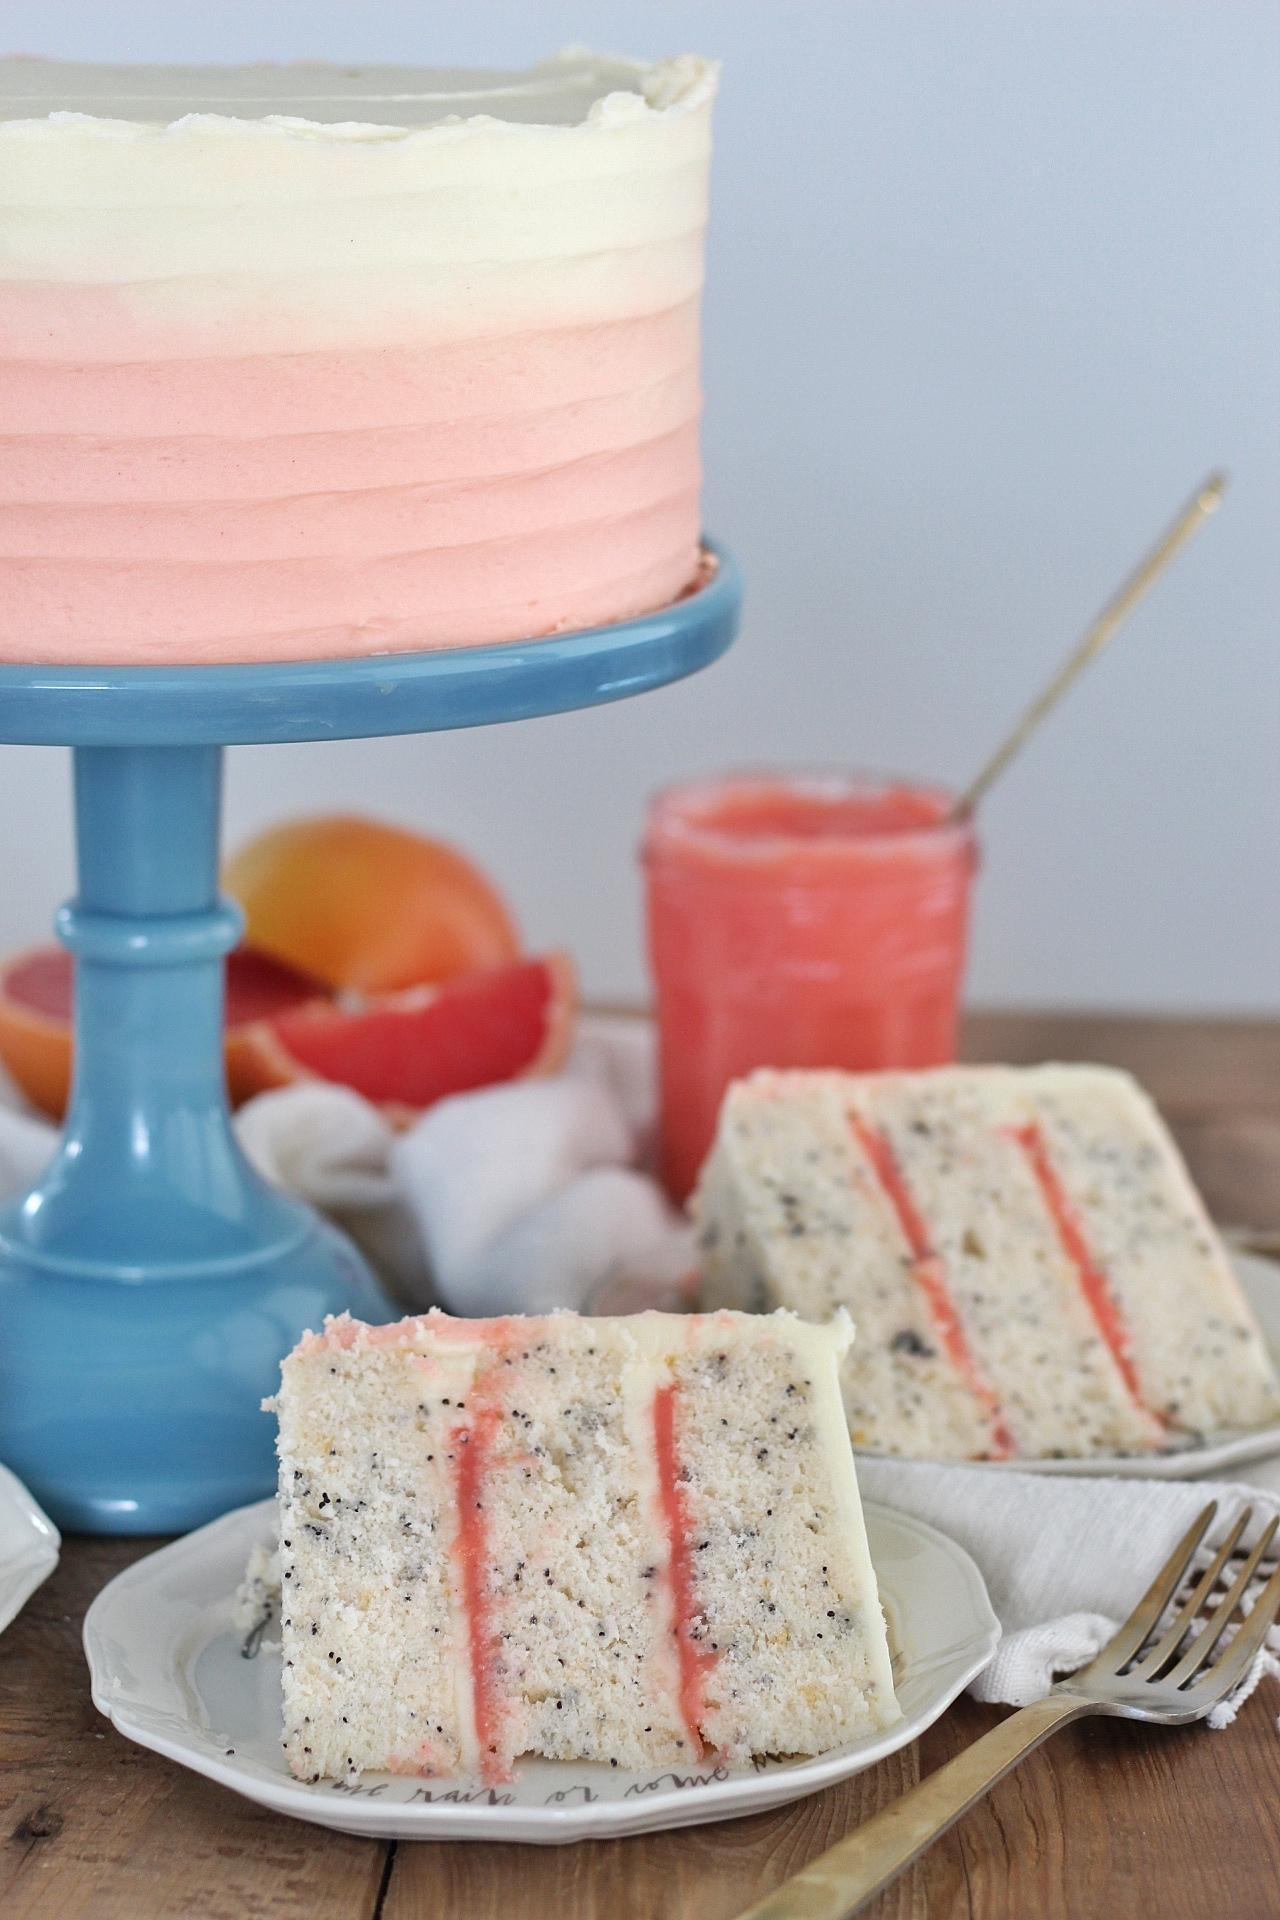 Grapefruit Poppy Seed Cake #cakebycourtney #Grapefruitpoppyseedcake #poppyseedcake #curd #easycake #grapefruit #grapefruitdessert